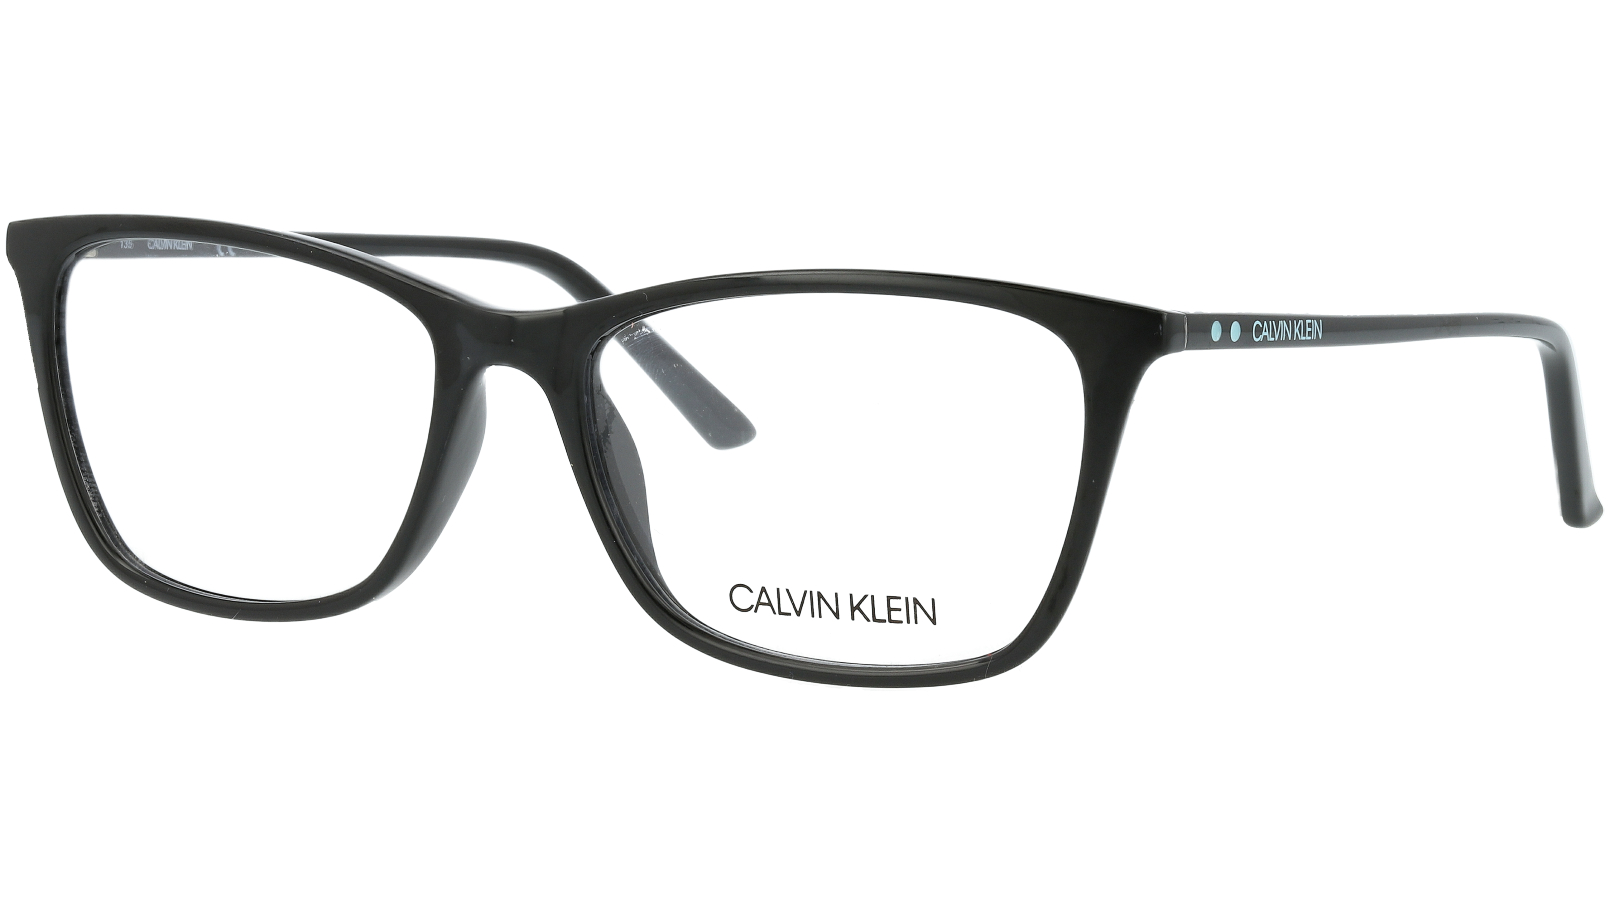 Calvin Klein CK18542 001 54 Black Glasses